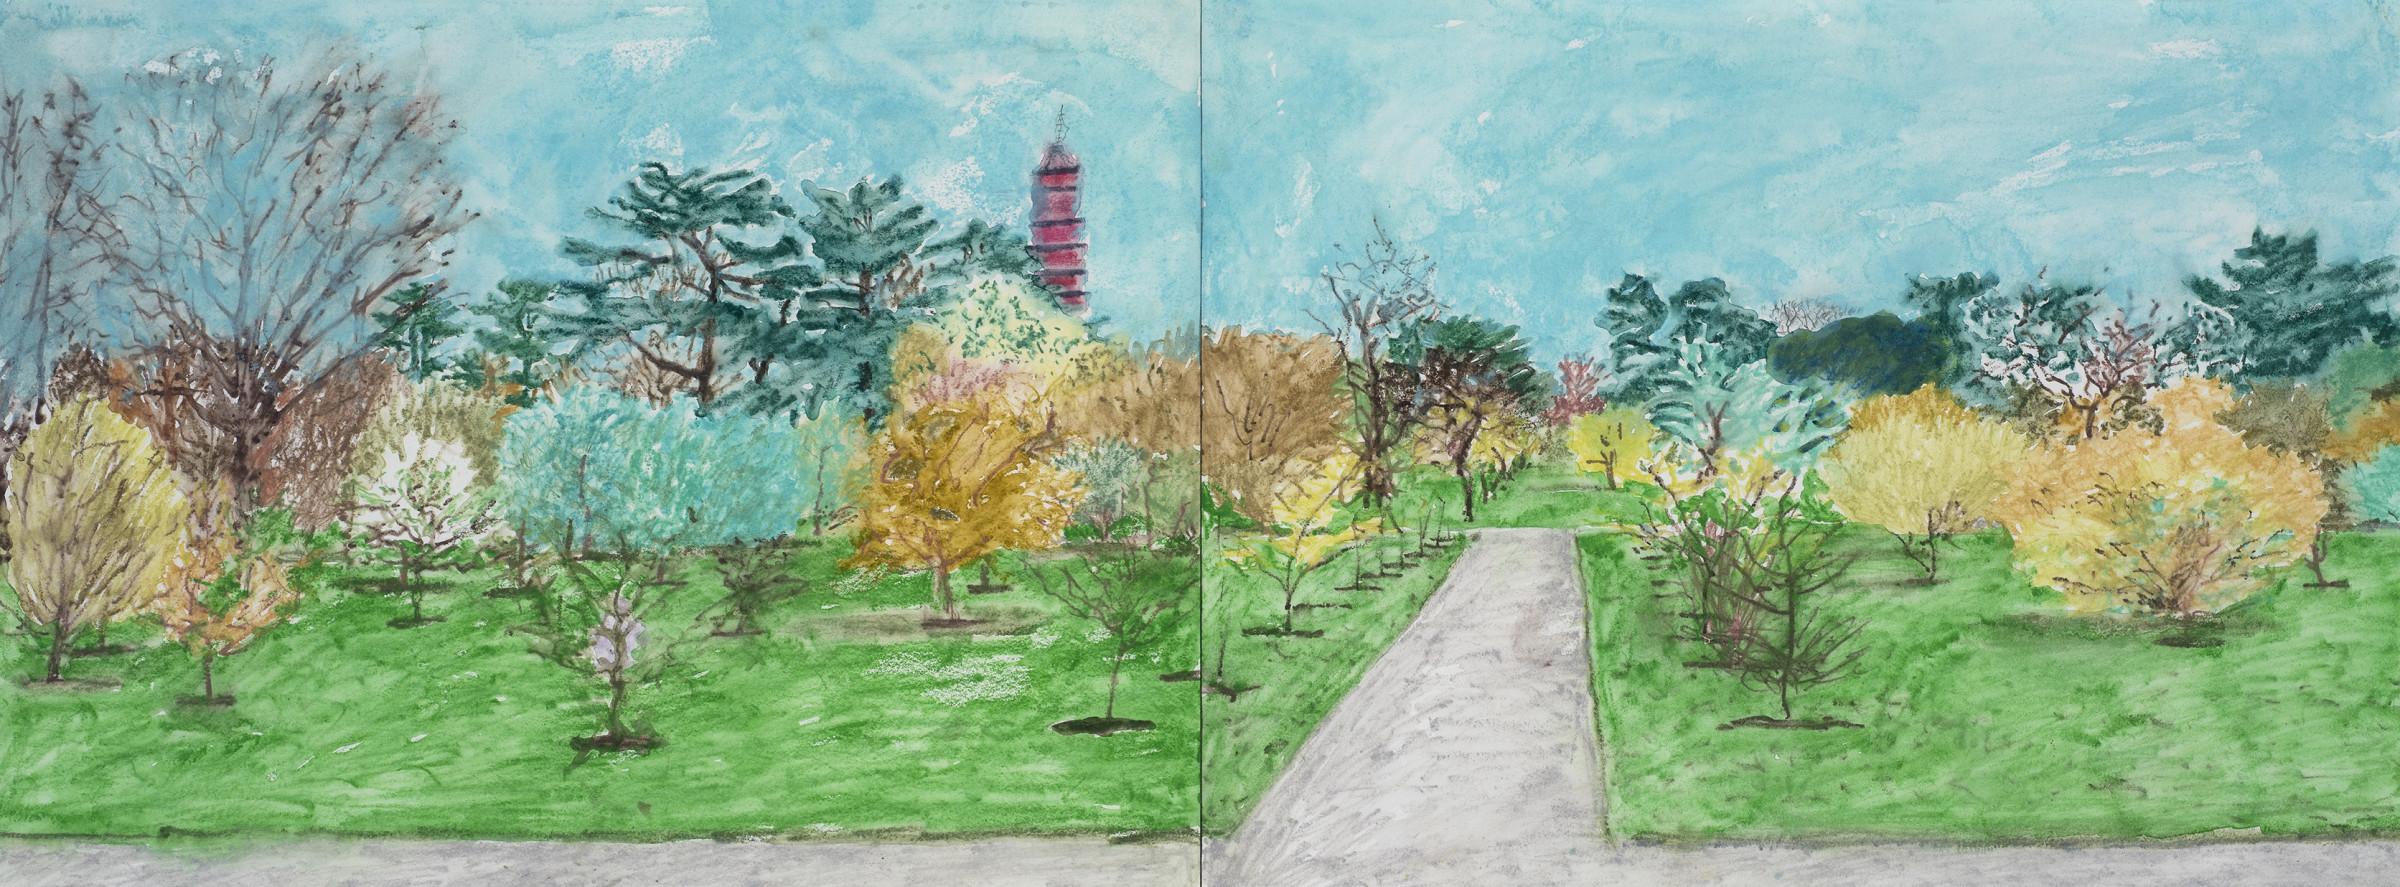 <span class=&#34;link fancybox-details-link&#34;><a href=&#34;/content/viewing-room/29/artworks636/&#34;>View Detail Page</a></span><div class=&#34;artist&#34;><strong>Adrian Berg</strong></div> 1929-2011<div class=&#34;title&#34;><em>Kew Gardens 10th & 11th April </em>, 2001</div><div class=&#34;medium&#34;>Watercolour on paper</div><div class=&#34;dimensions&#34;>31 x 84cm (2 sheets)</div>£ 4,250.00